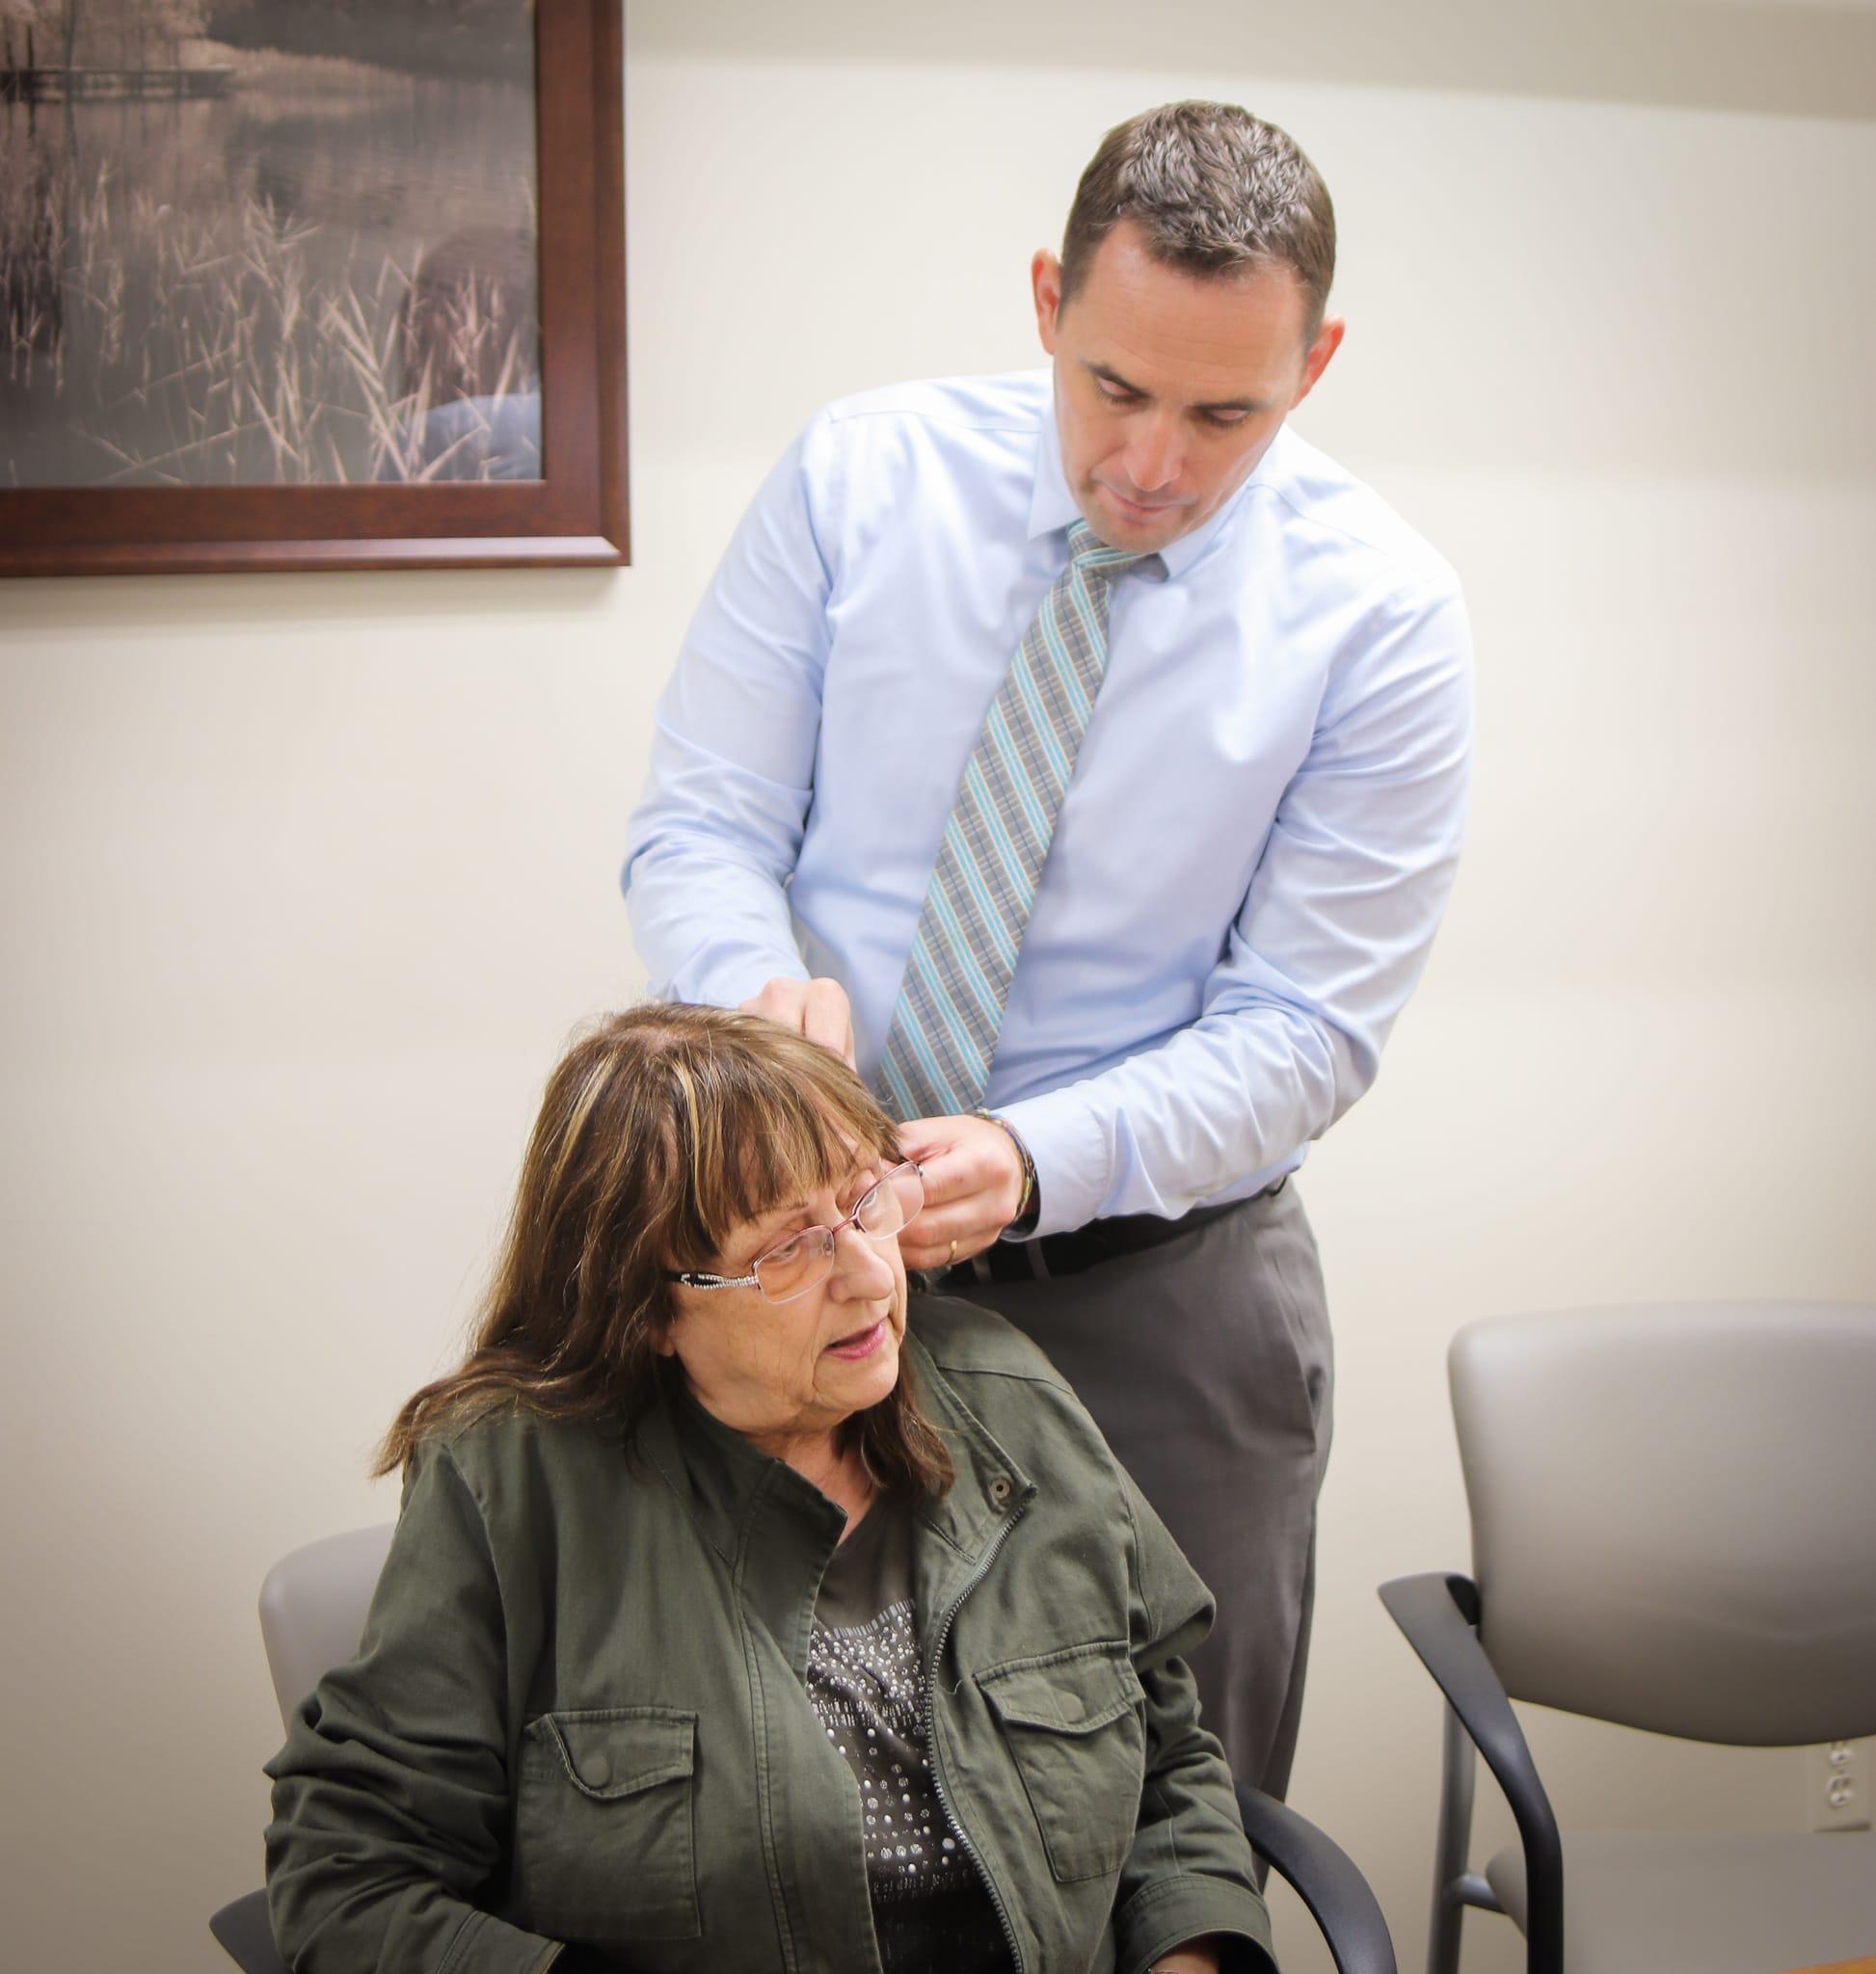 dr blake studley examining hearing aid